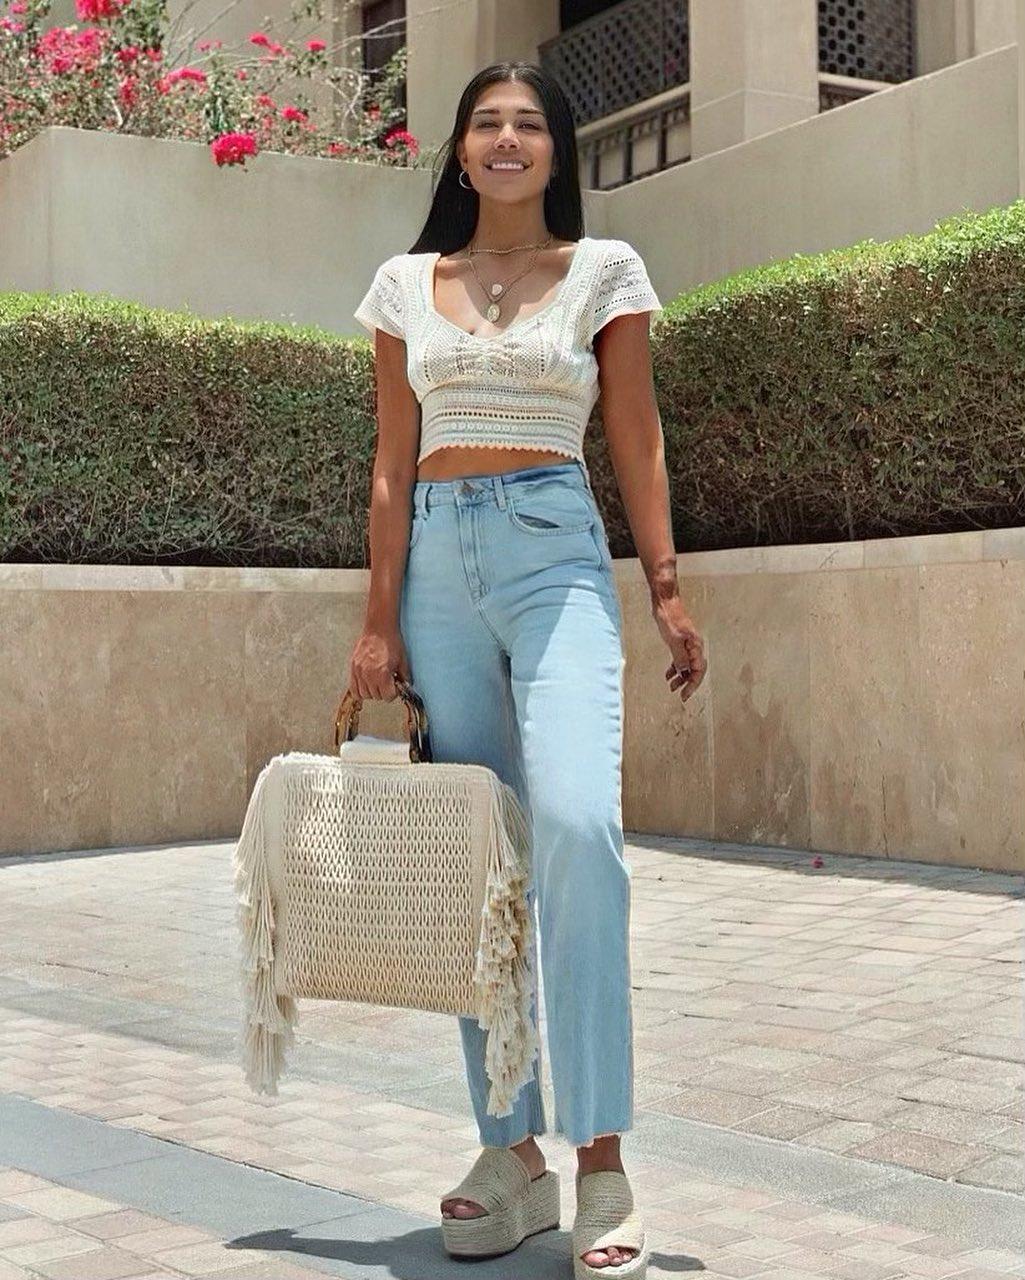 fringed canvas shopper bag de Zara sur sandraikladious